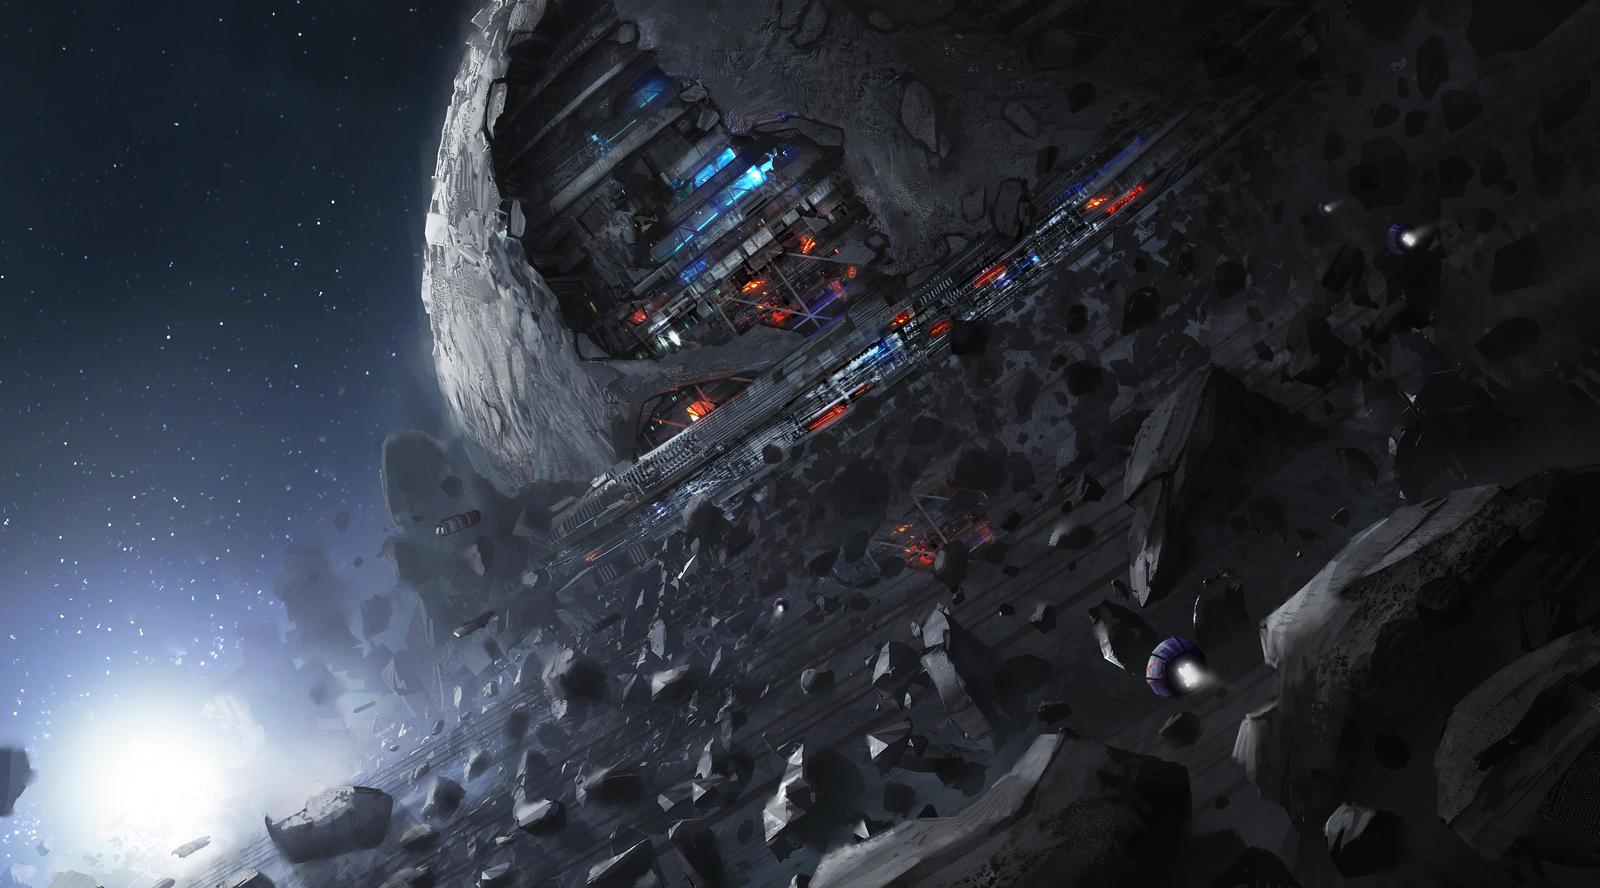 donjon SciFi World Generator